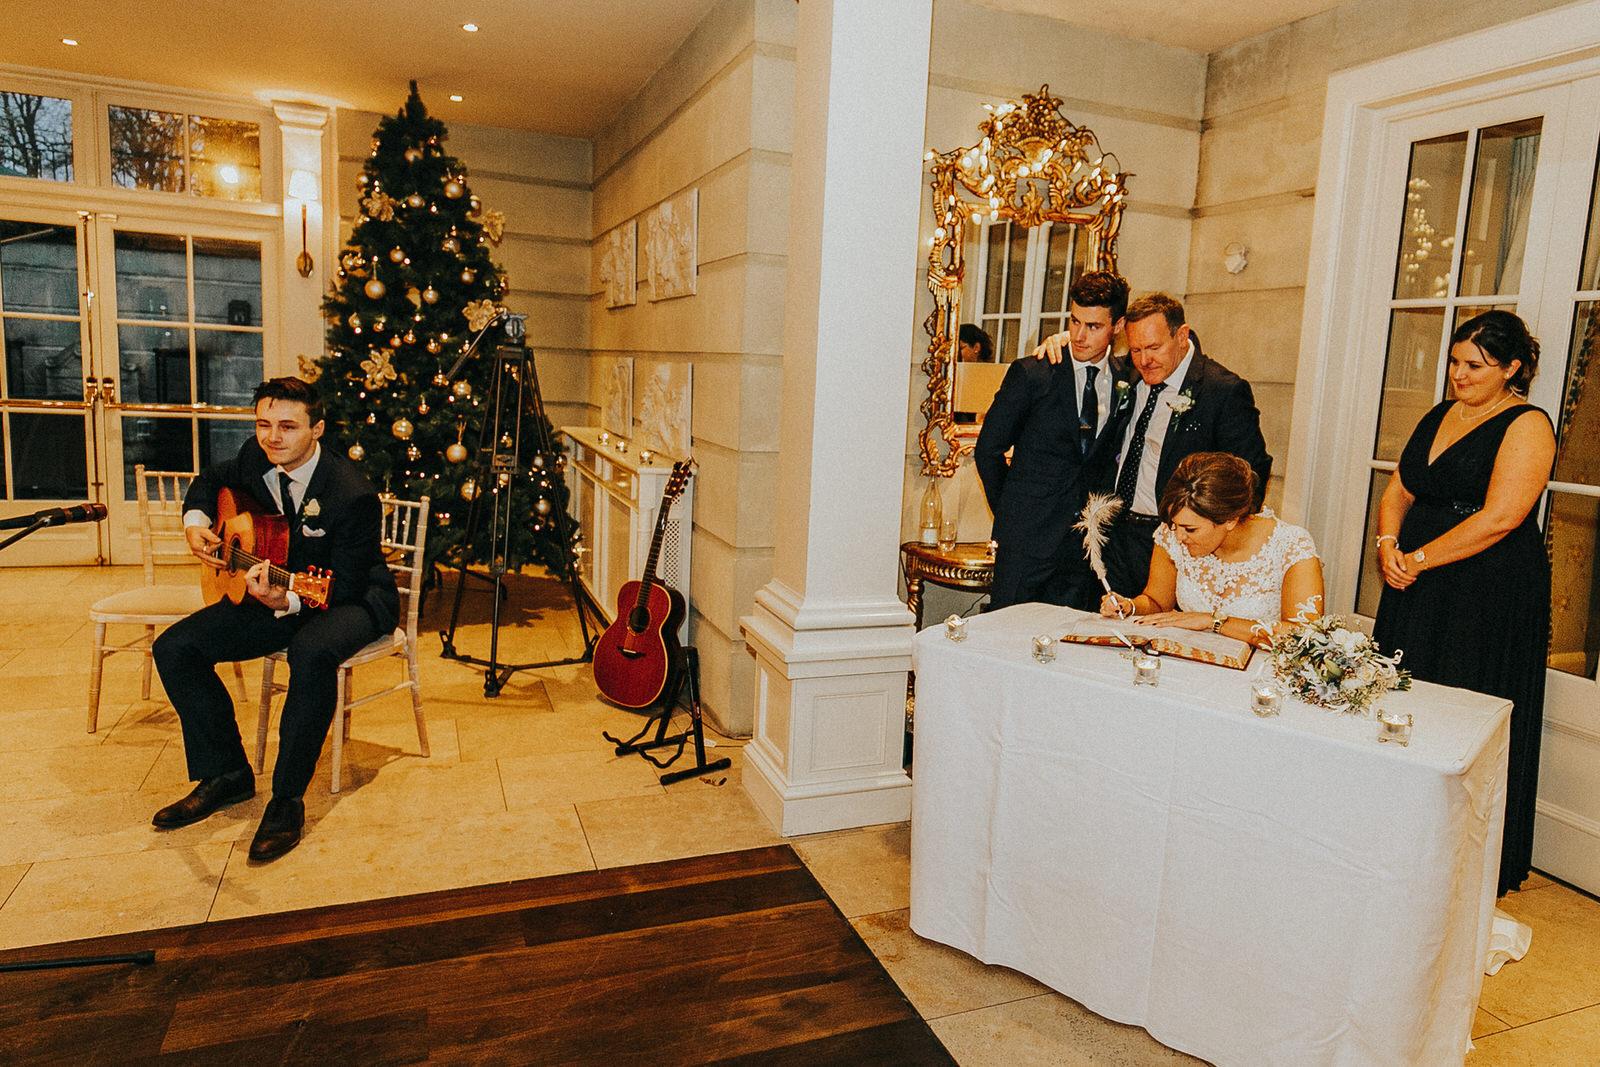 Roger_Kenny_wedding_photographer_Tankardstown_610.jpg